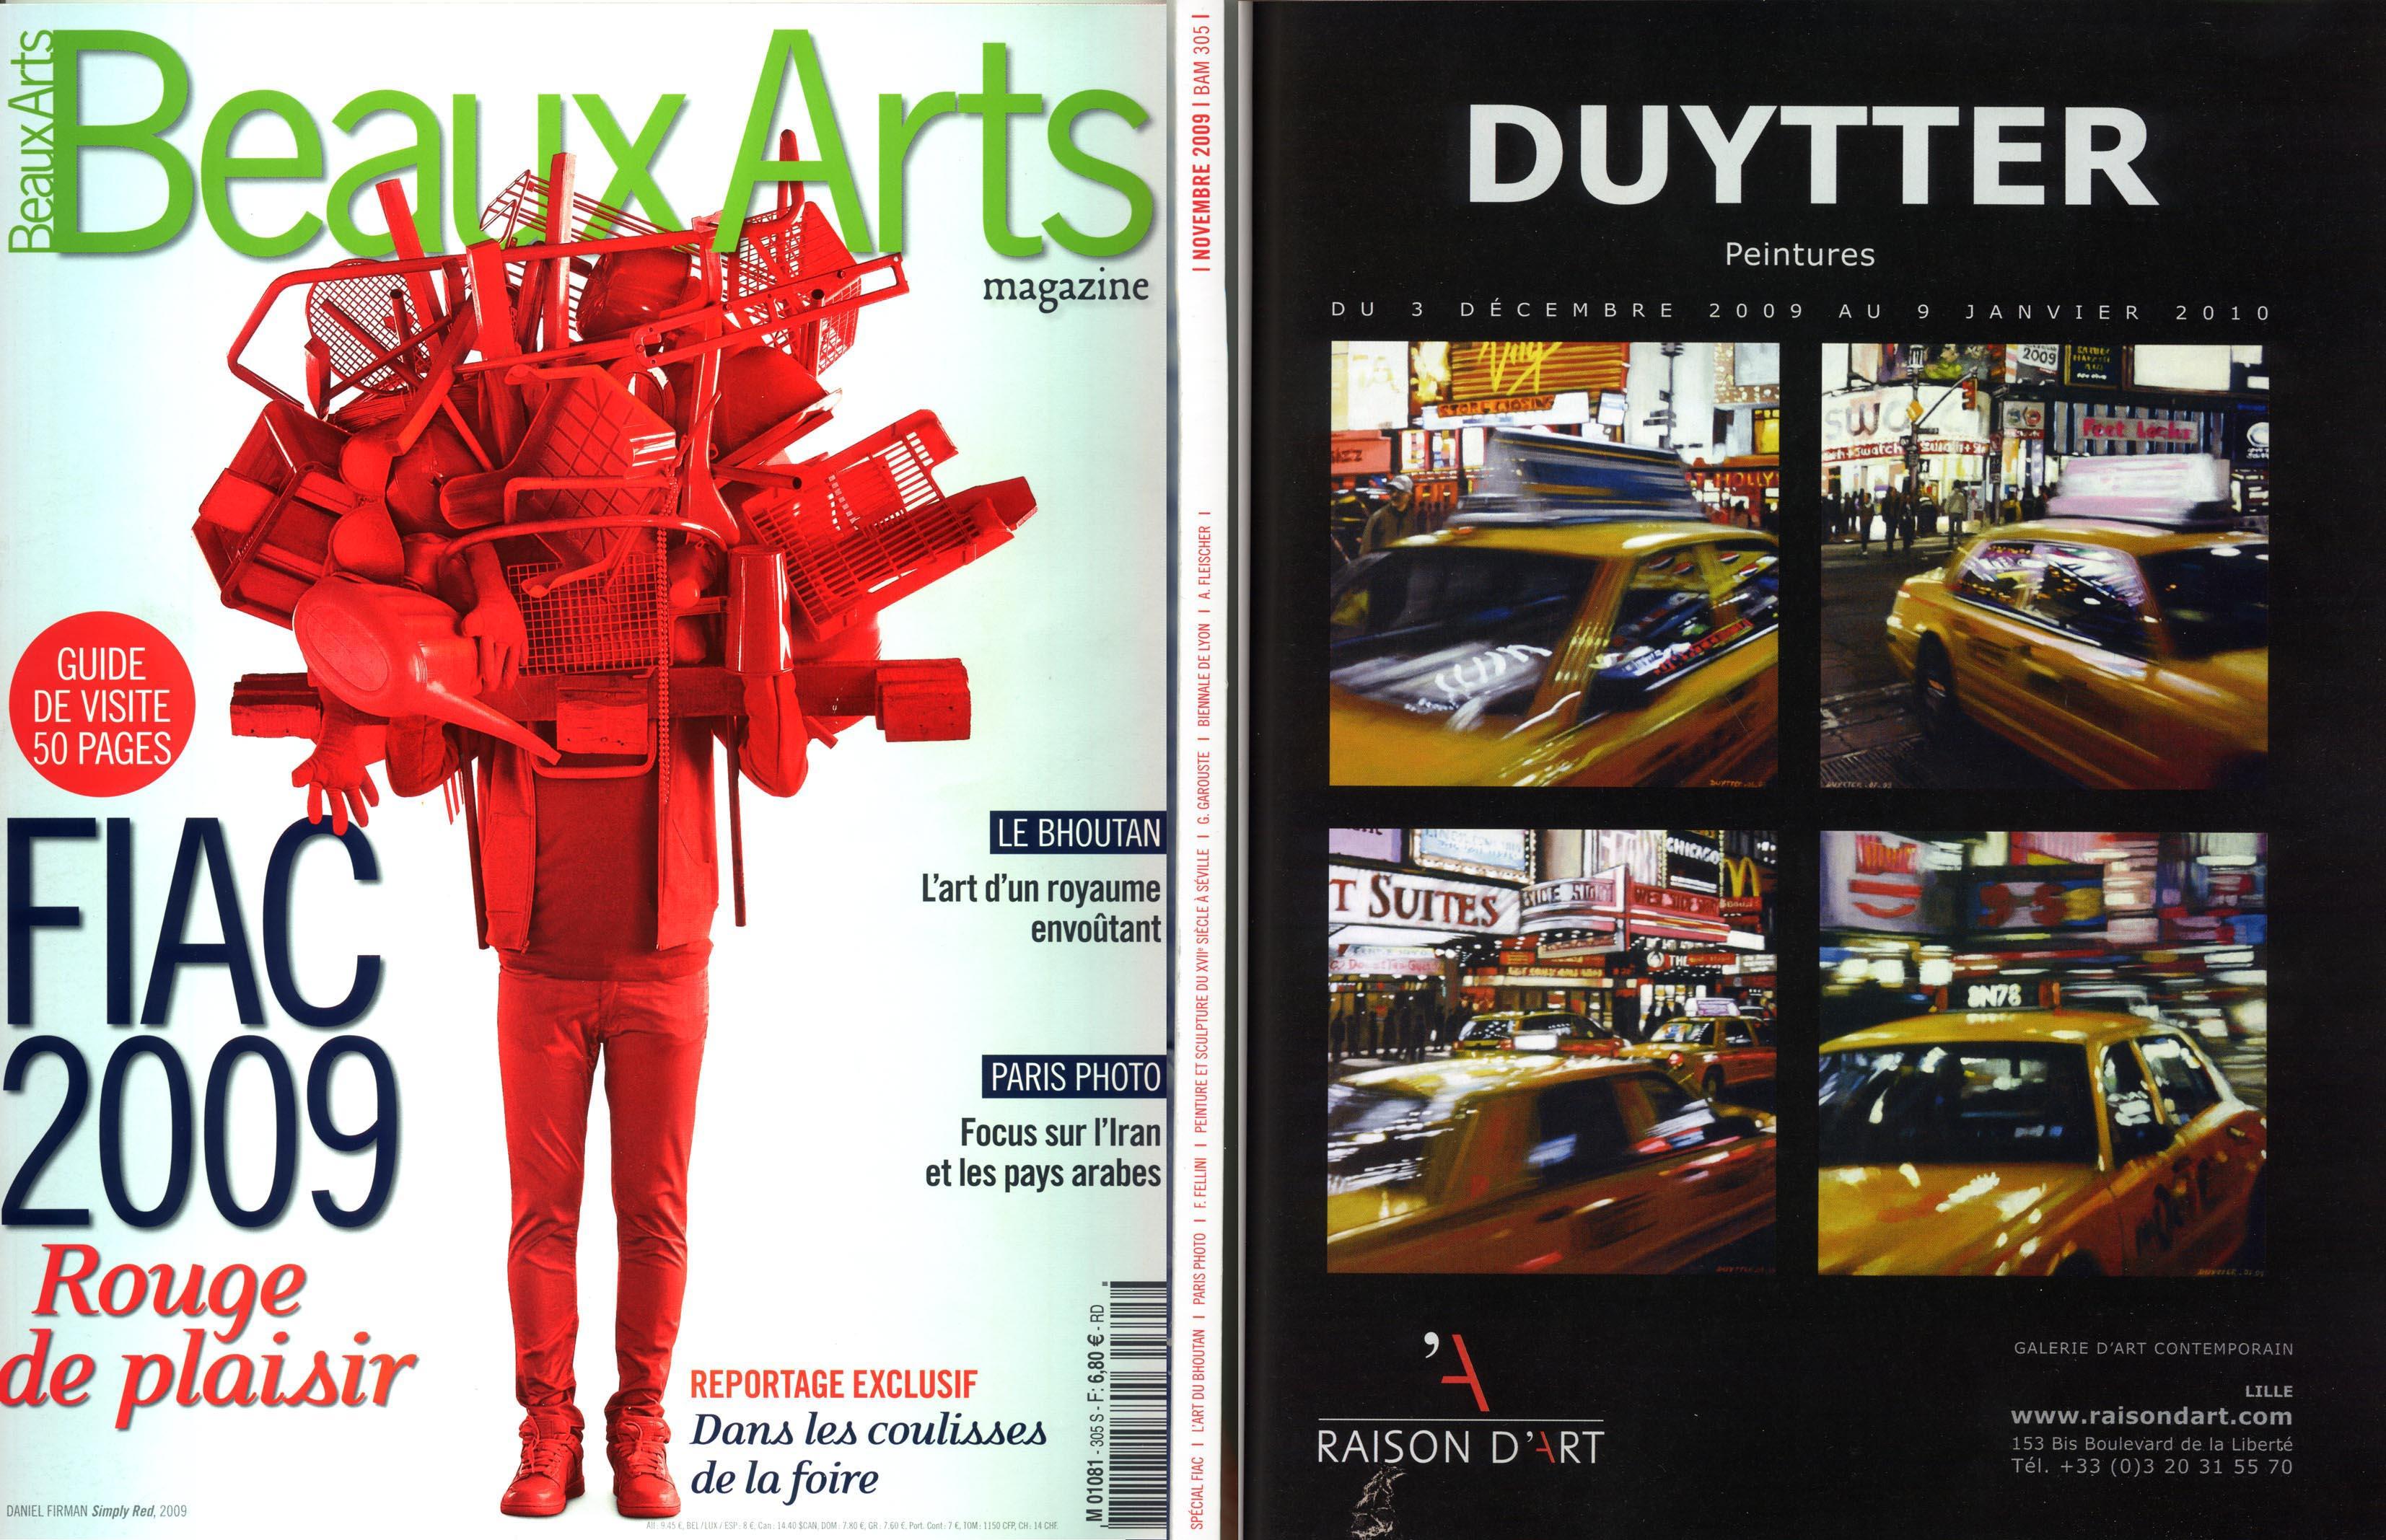 Beaux Arts magazine.jpg